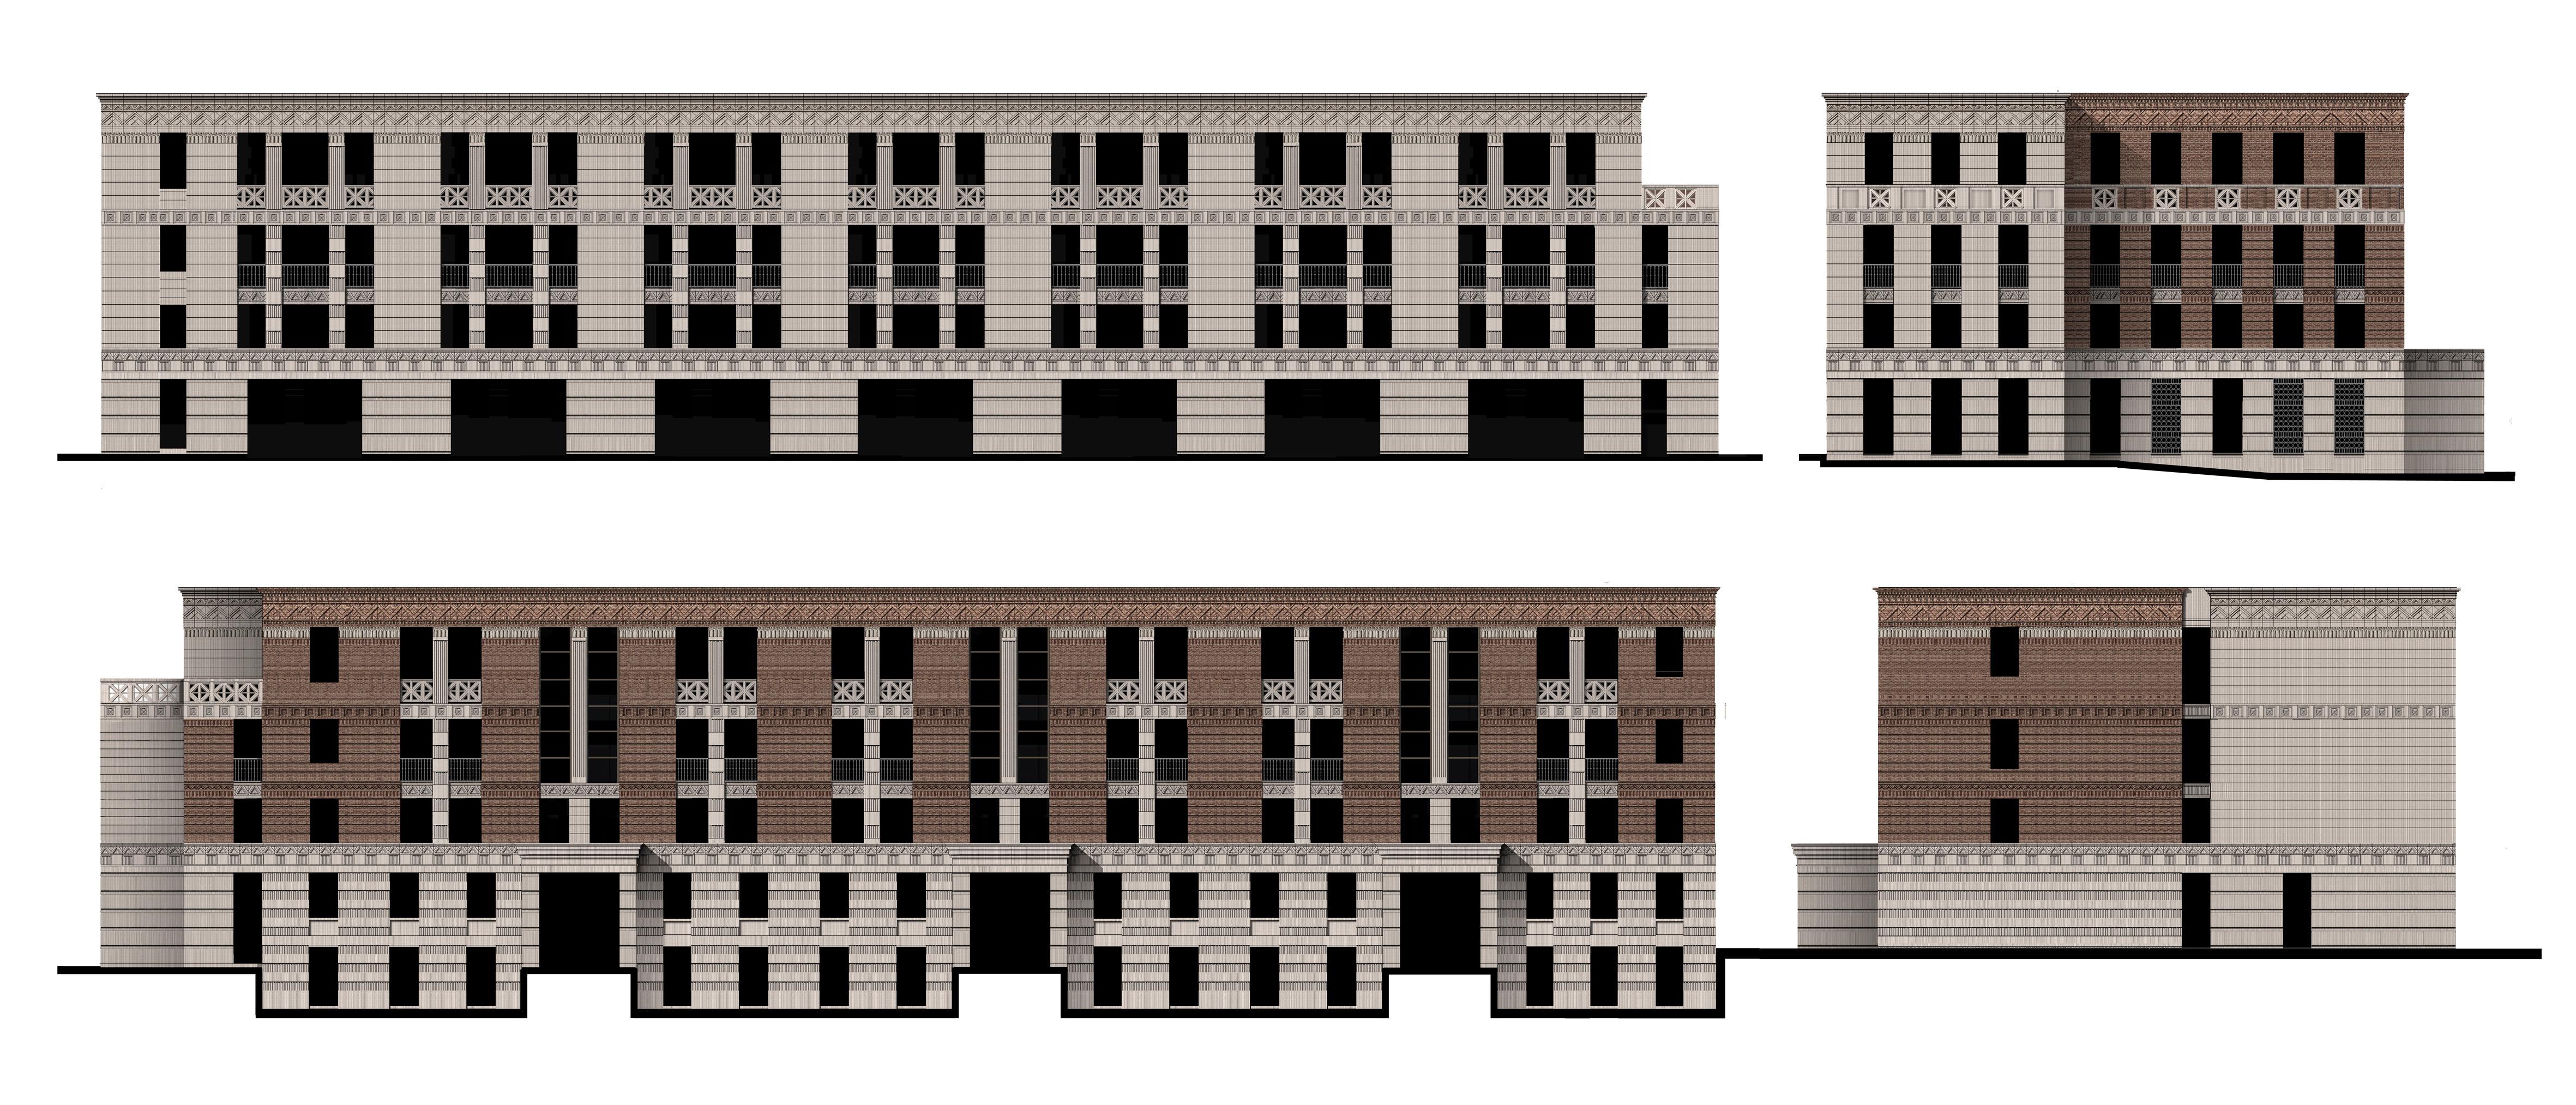 BUILDING 3